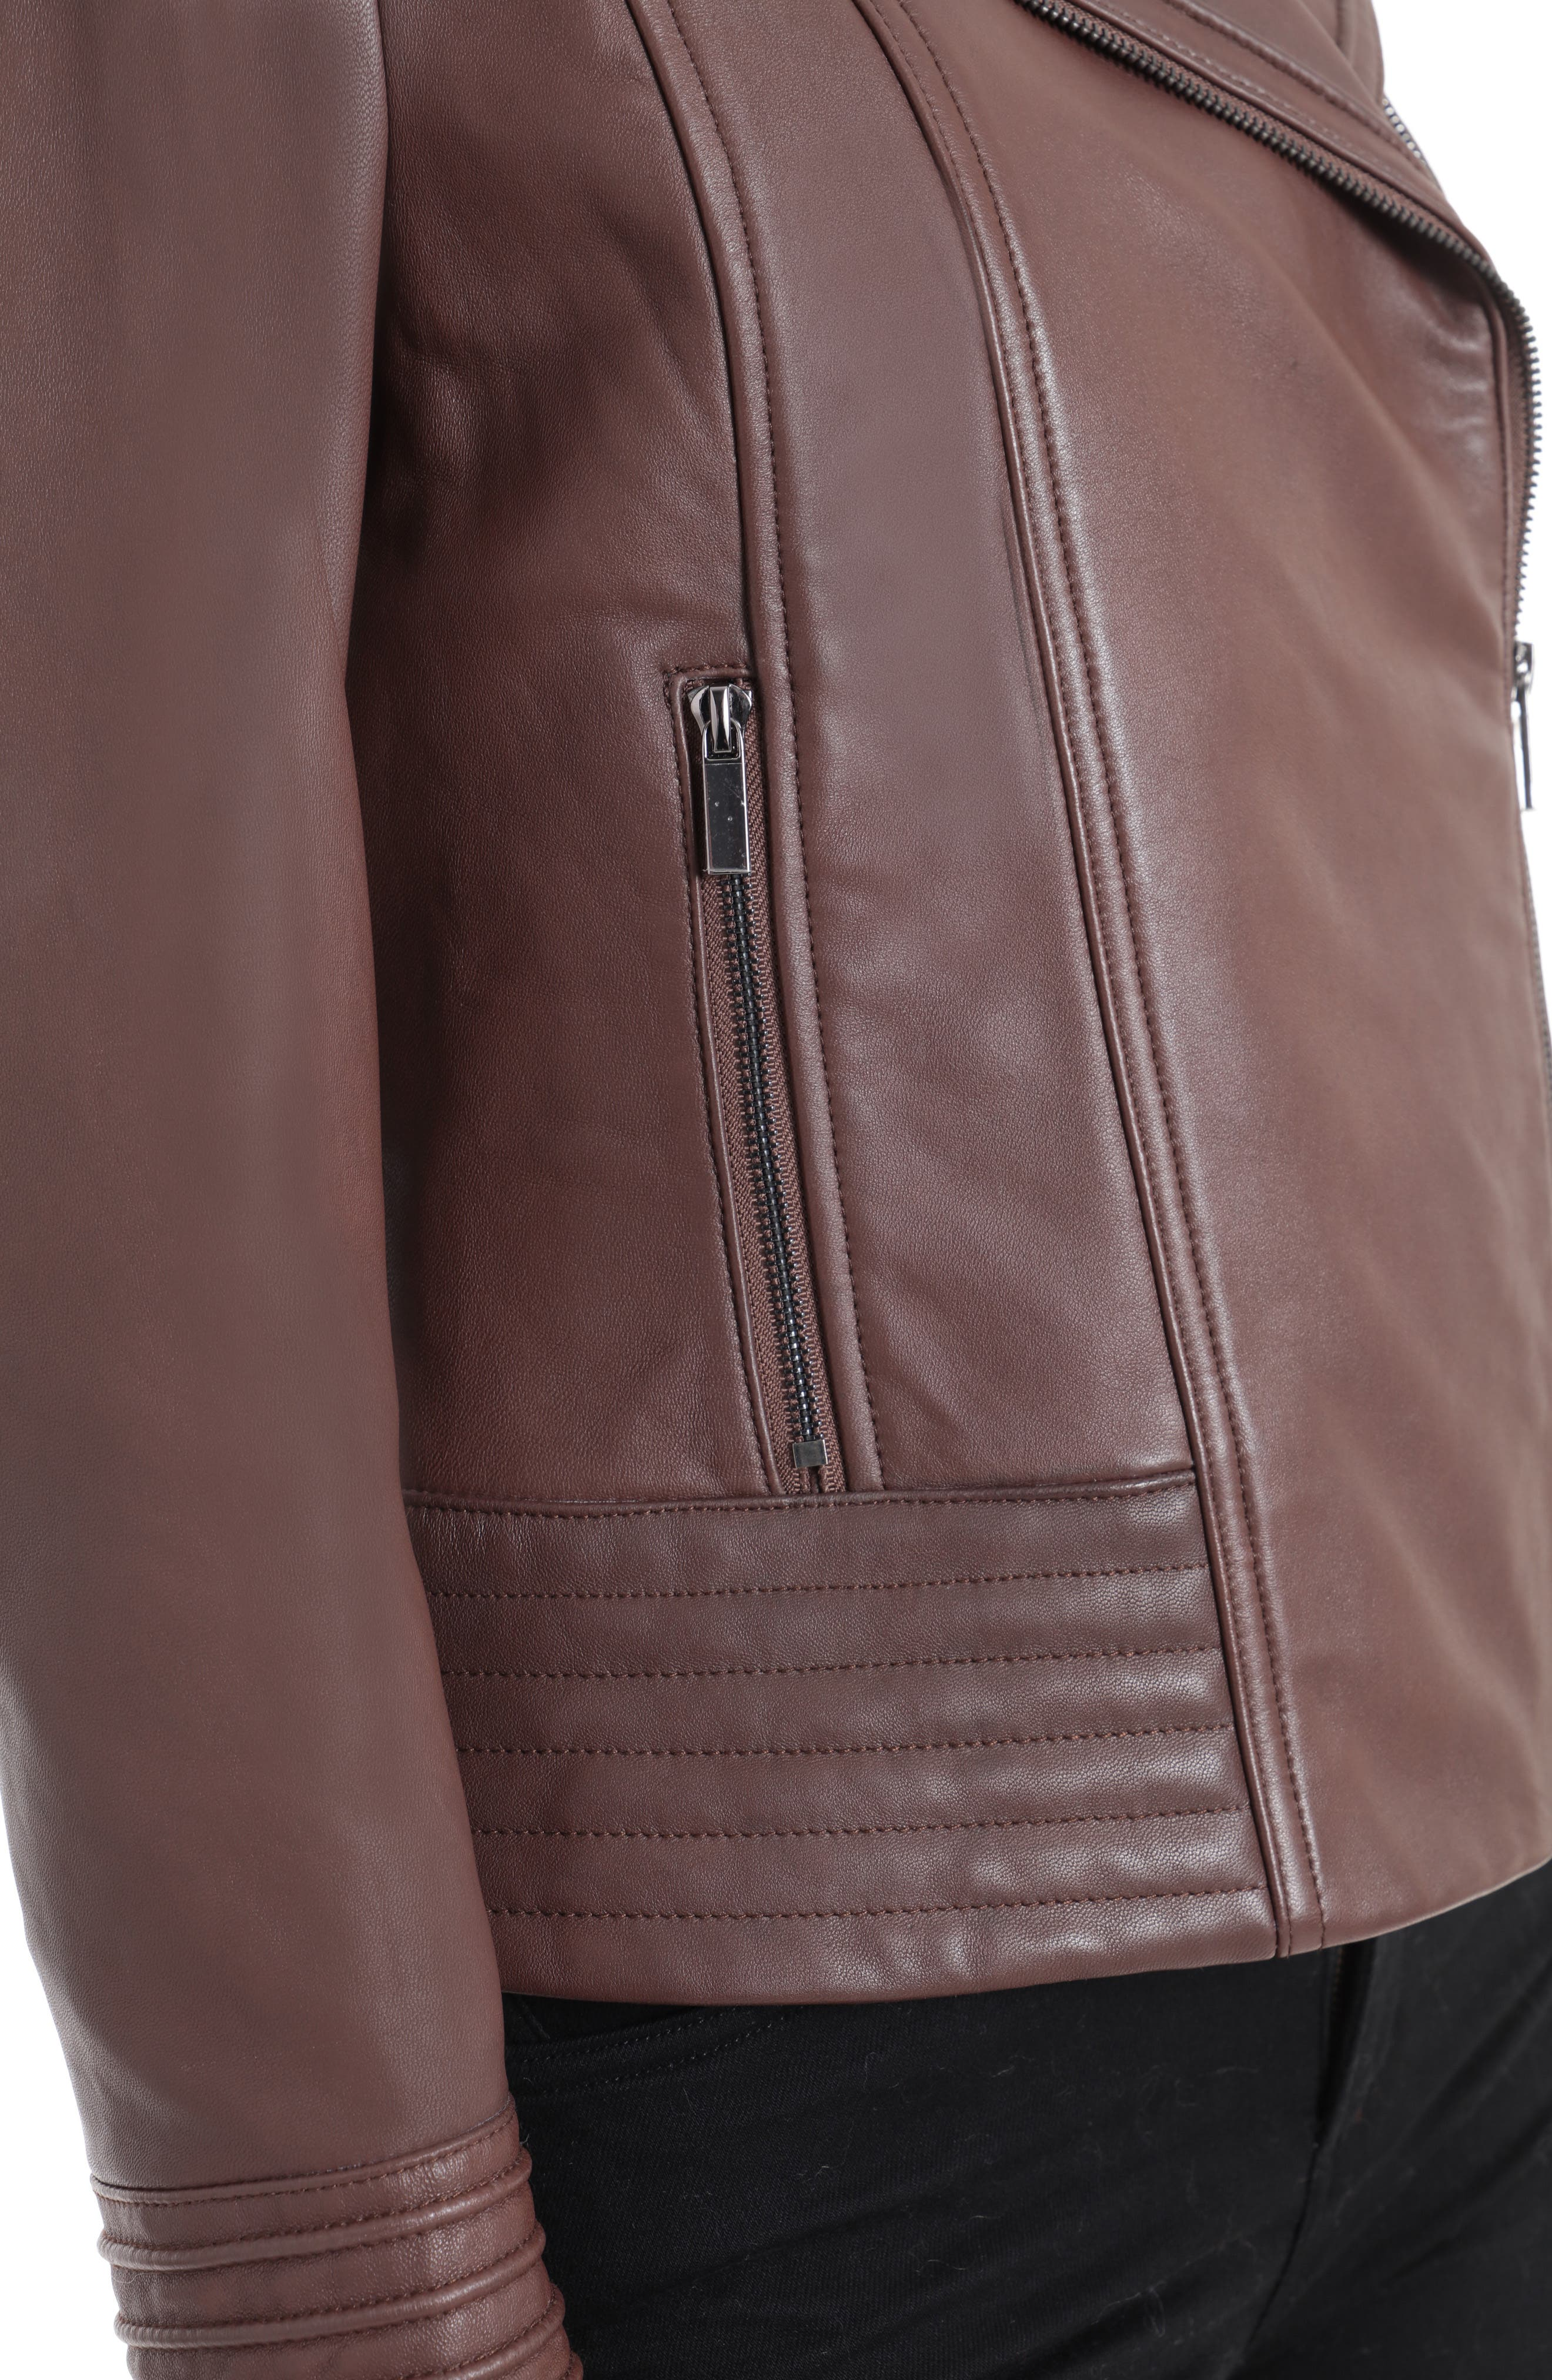 BADGLEY MISCHKA COLLECTION, Badgley Mischka Gia Leather Biker Jacket, Alternate thumbnail 5, color, 201